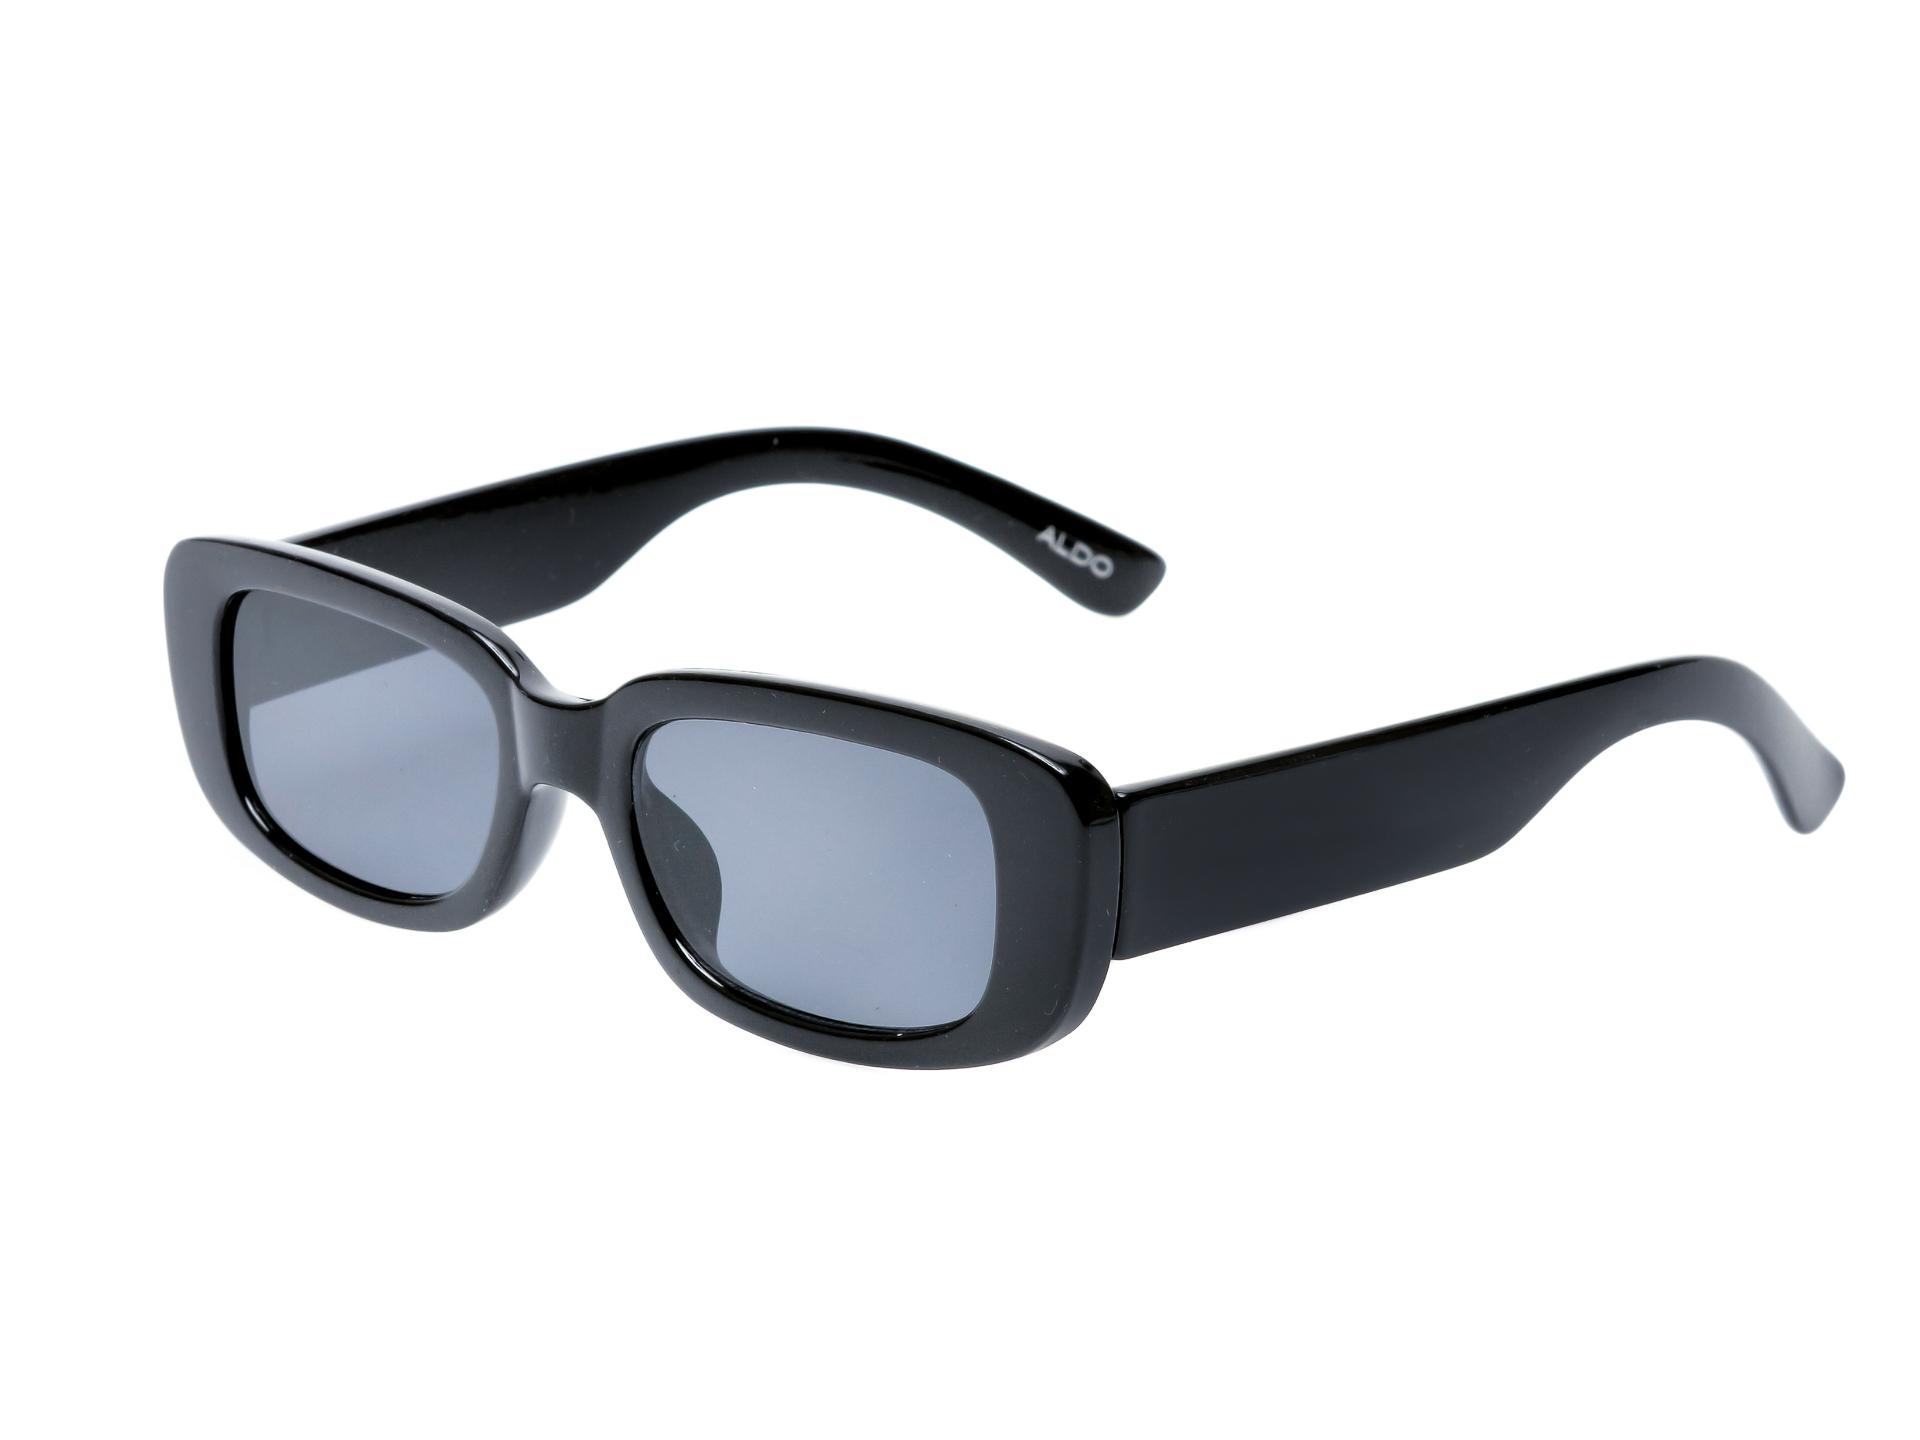 Ochelari de soare ALDO negri, Oloarwen001, din pvc imagine otter.ro 2021